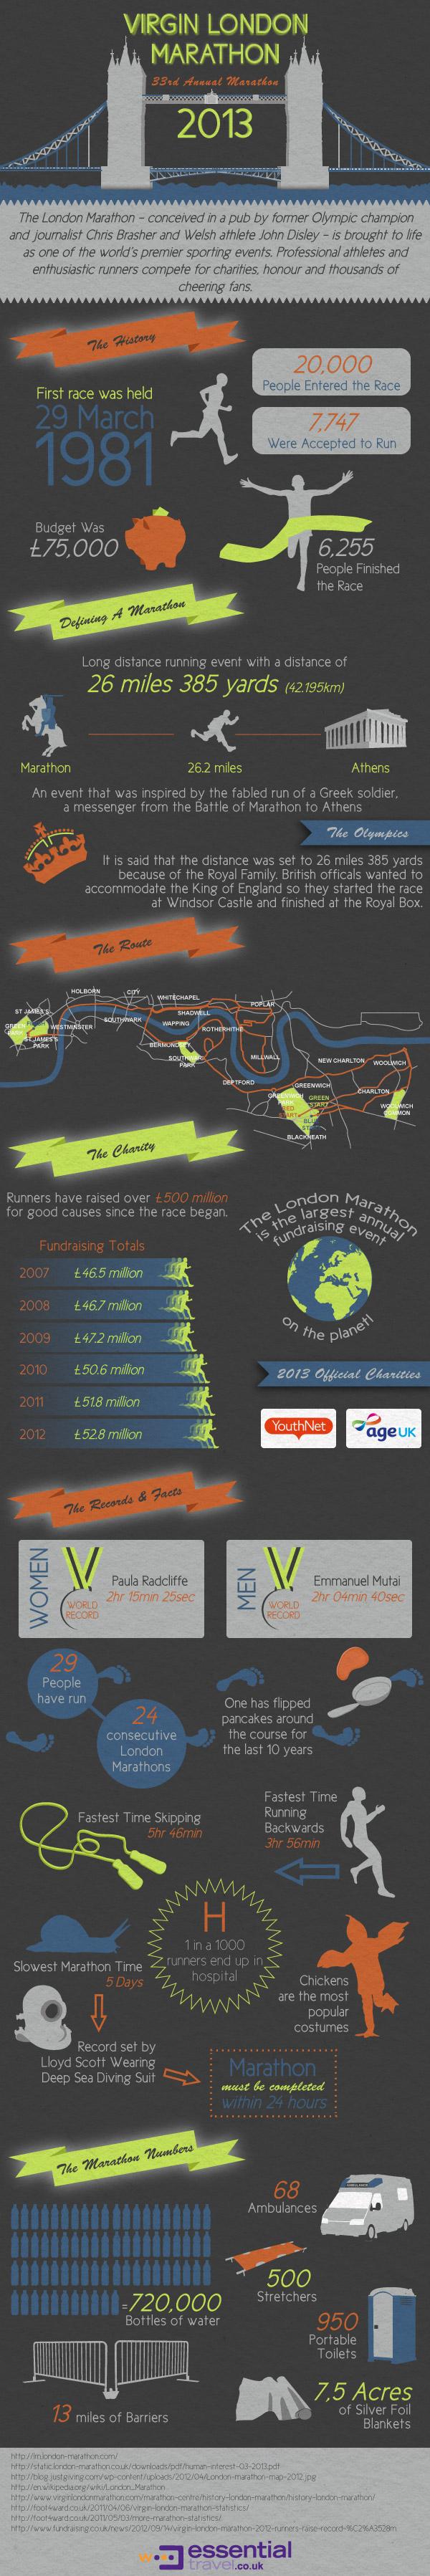 London Marathon Infographic